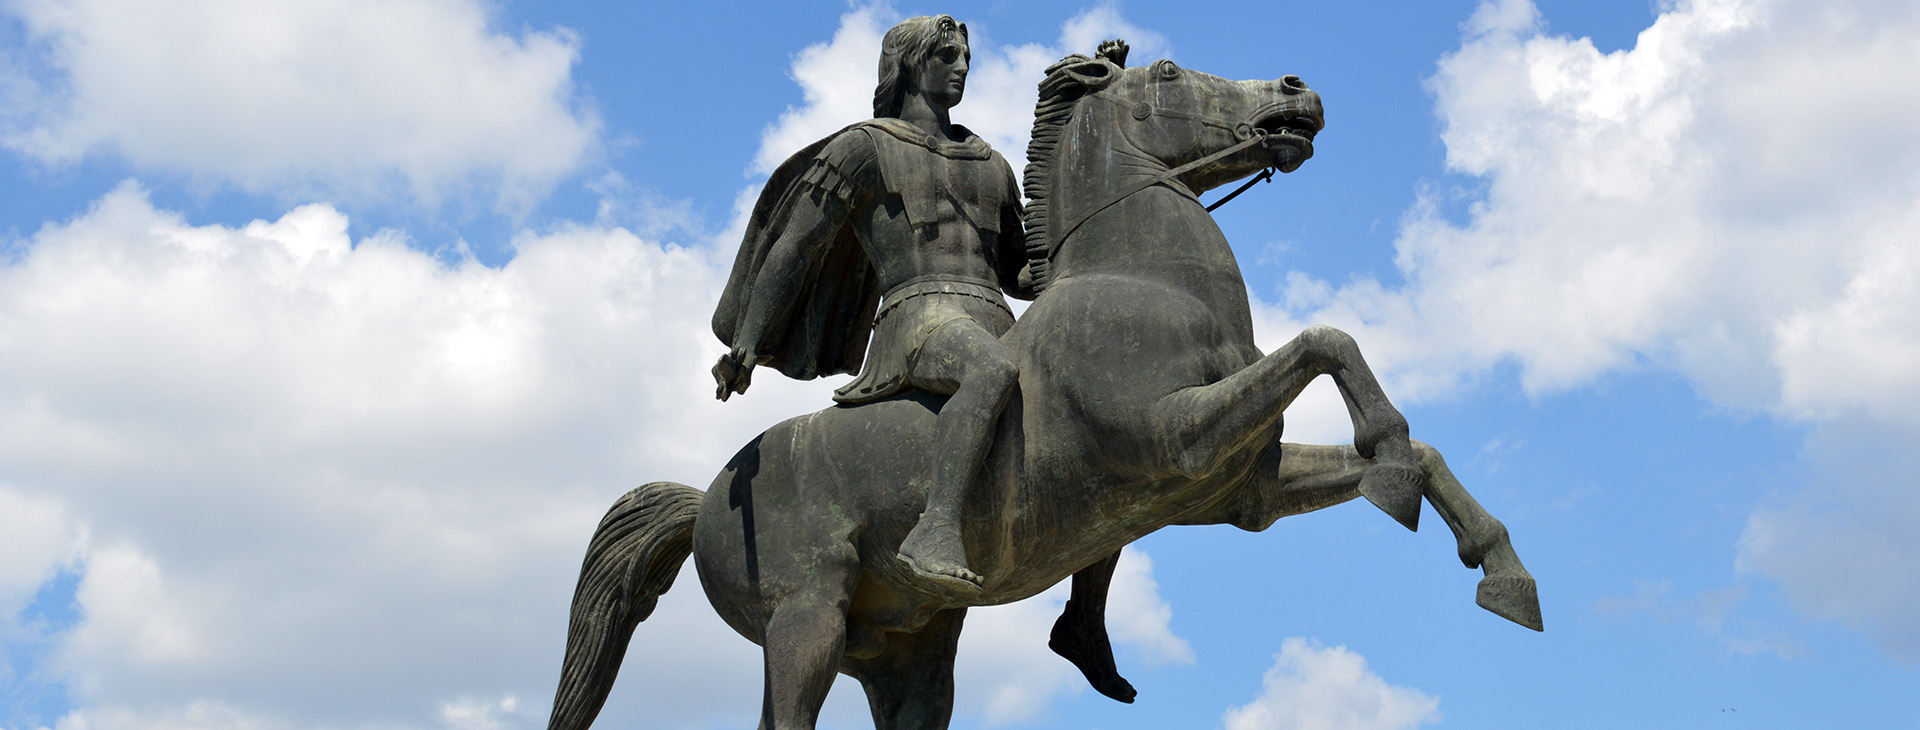 Alexander the Great statue, Thessaloniki City